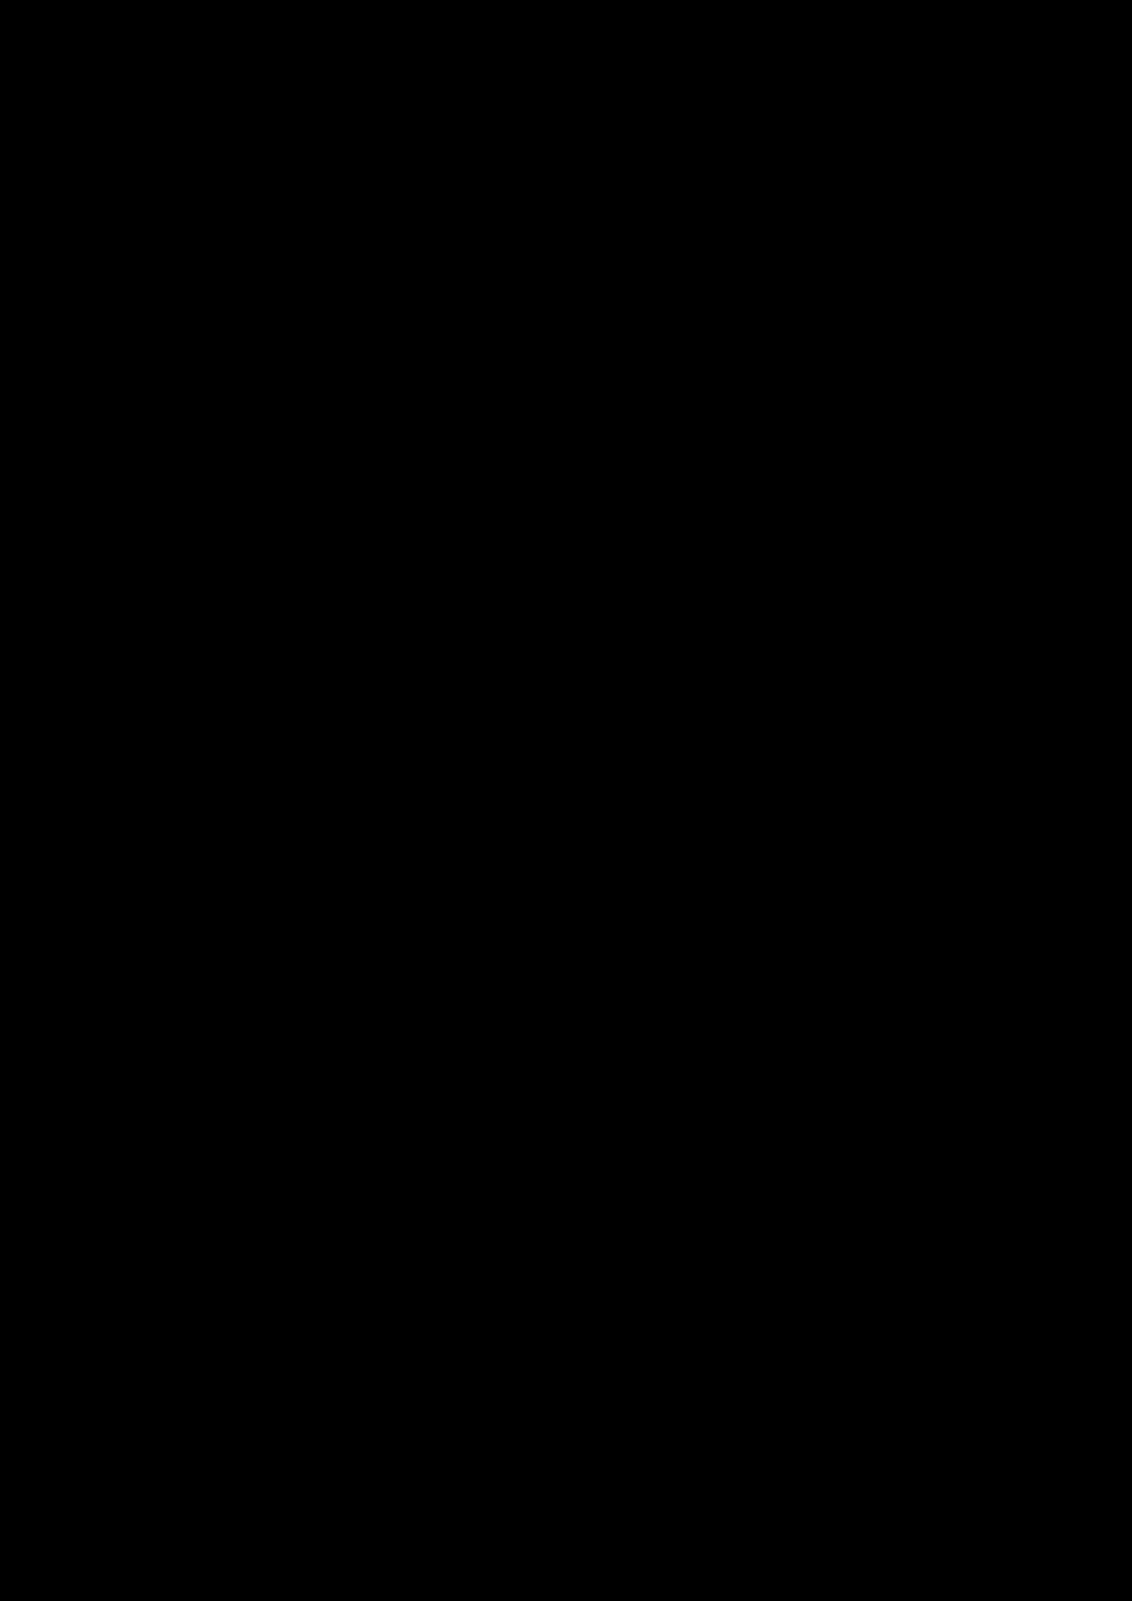 Ispoved Pervogo Boga slide, Image 39